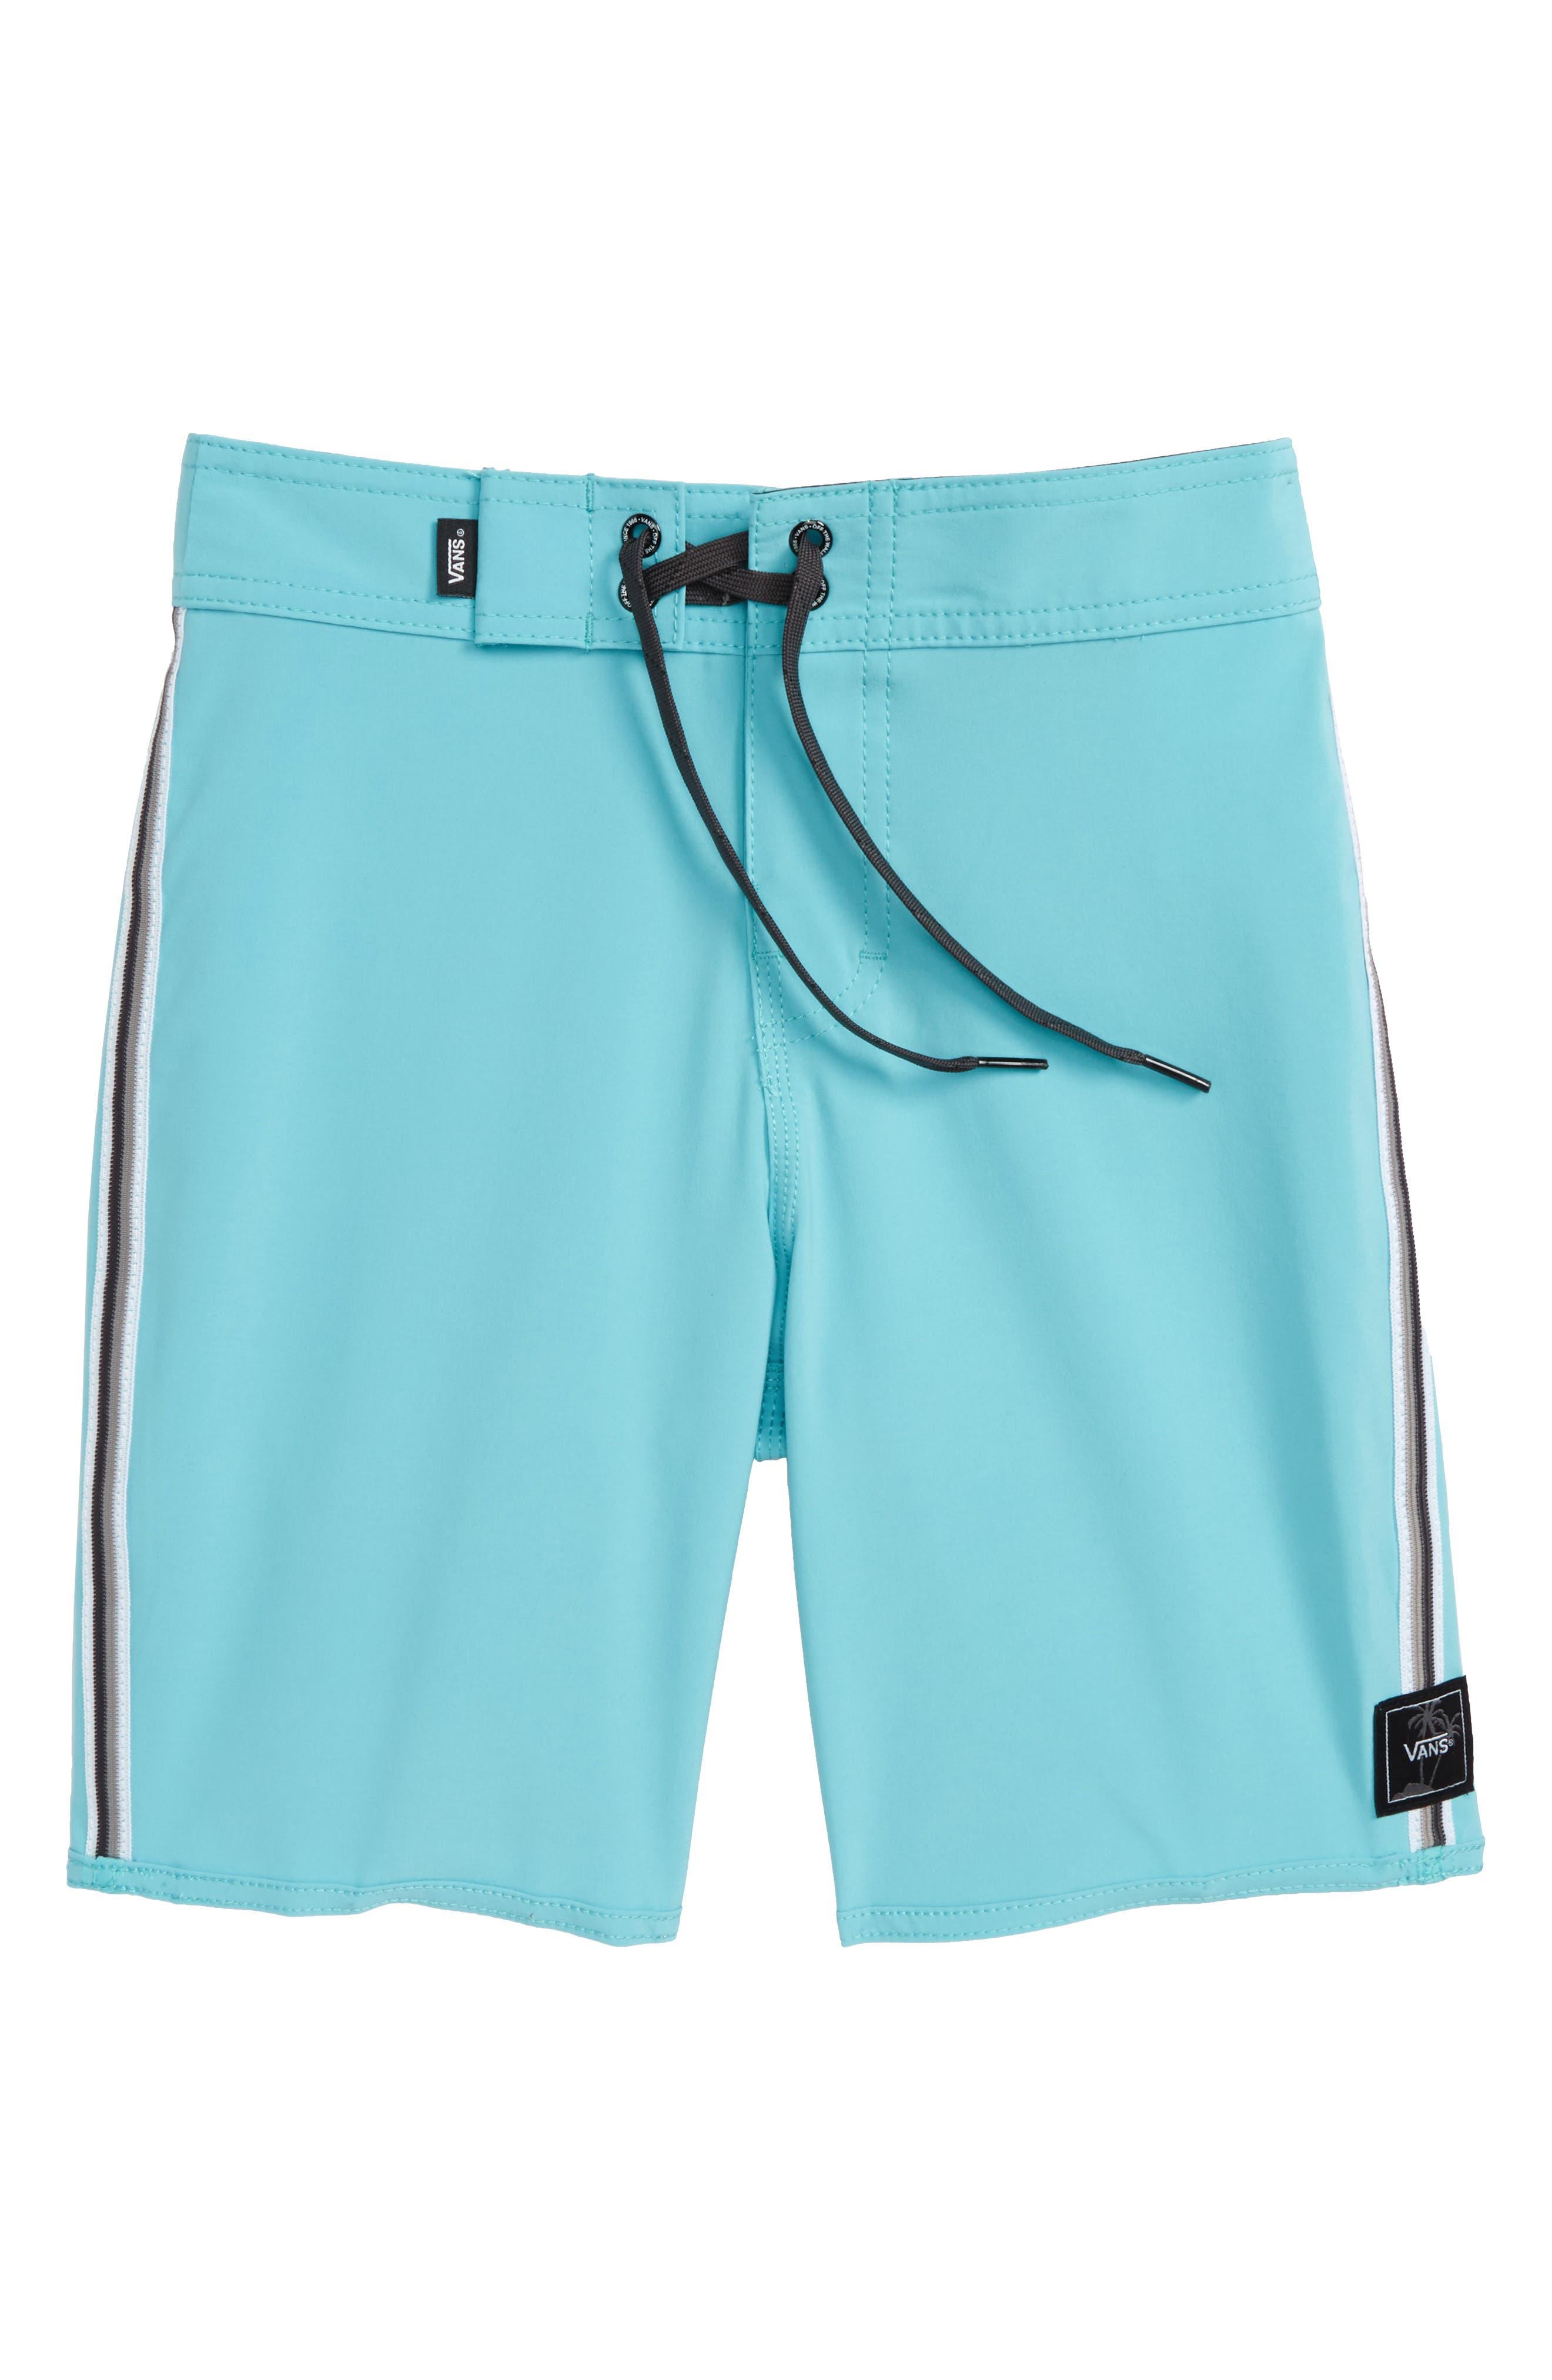 Sidestripe Board Shorts,                             Main thumbnail 1, color,